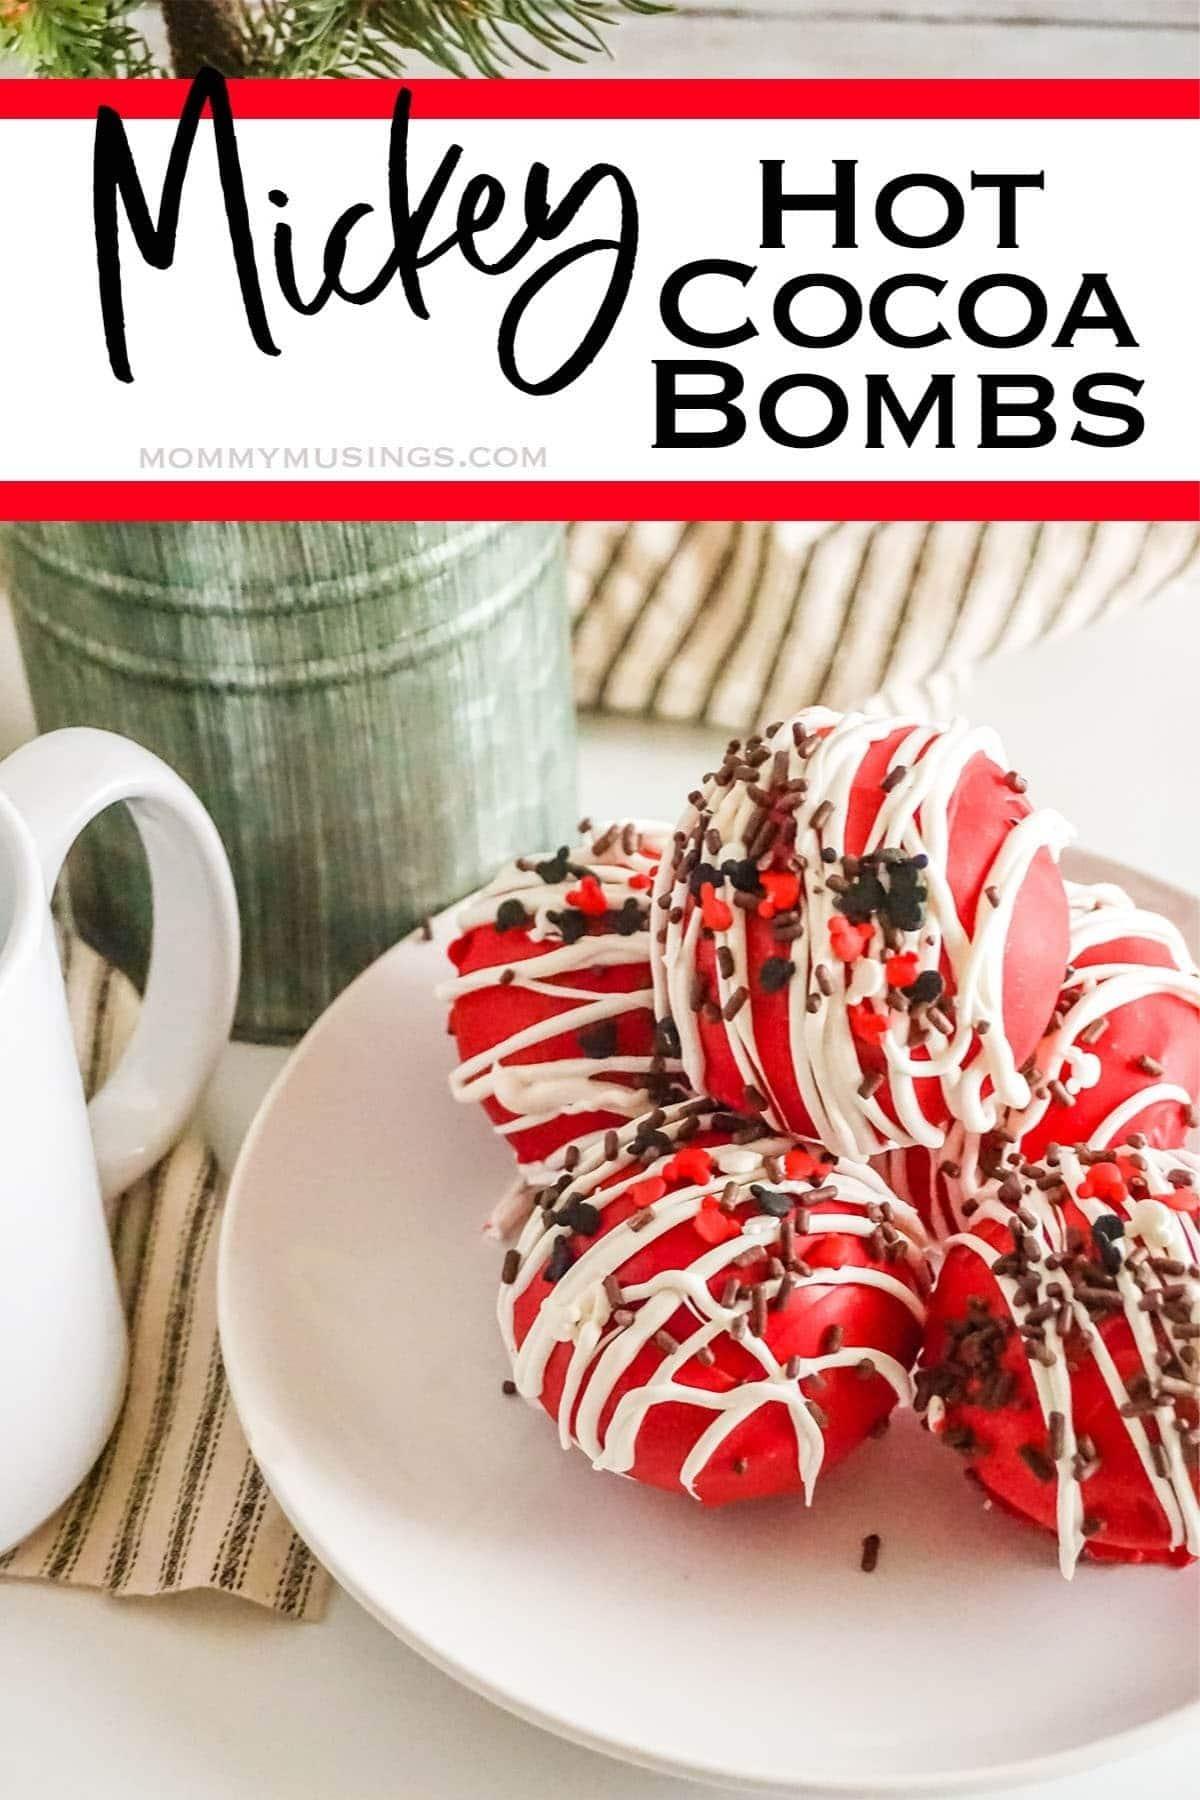 Mickey Mouse hot cocoa bomb